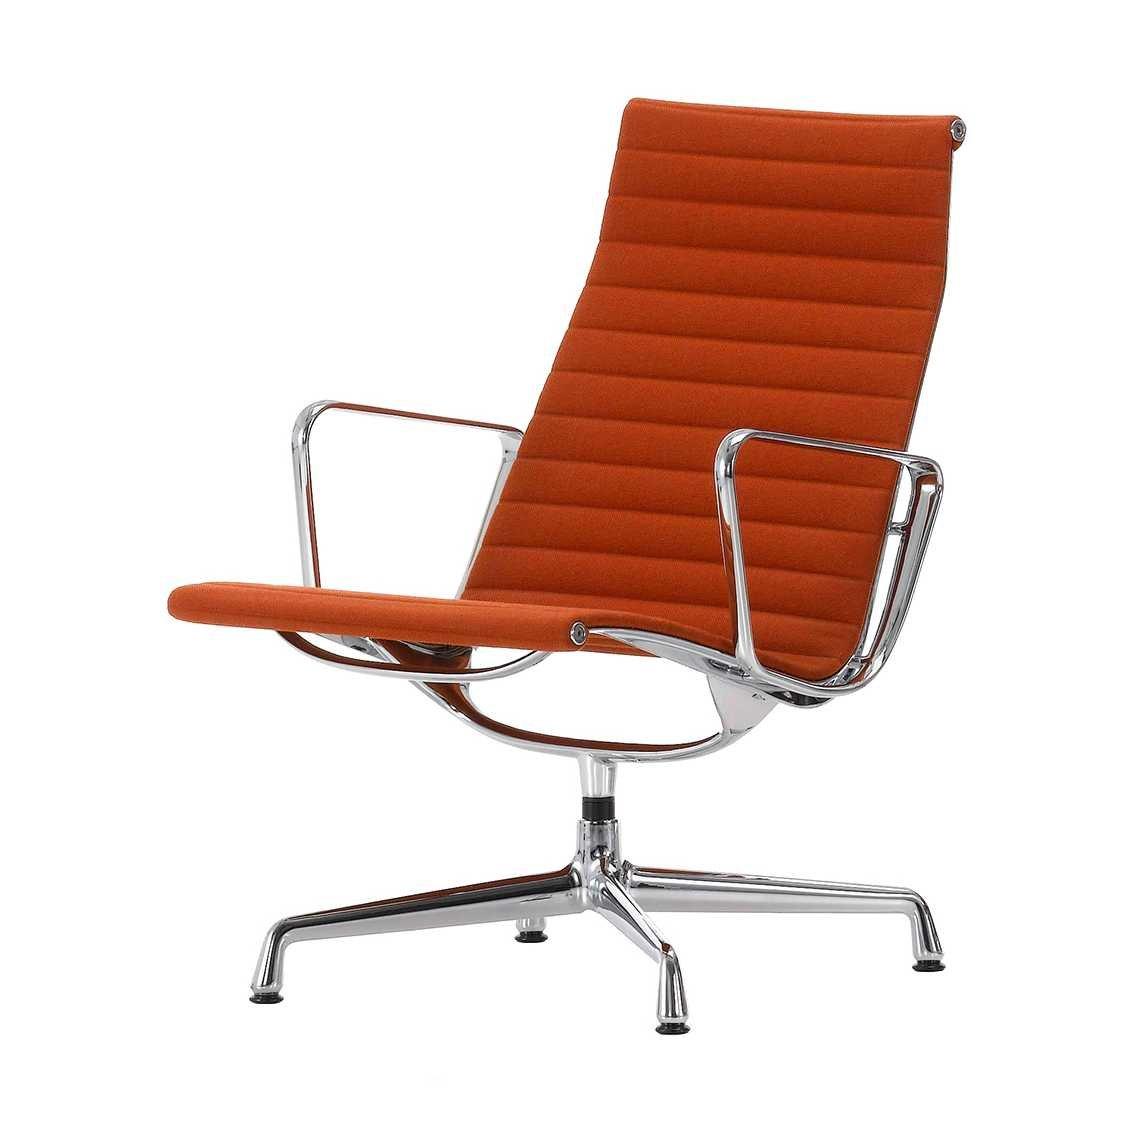 Vitra Aluminium Chair EA 115 Fauteuil - Hopsack Rood/Cognac